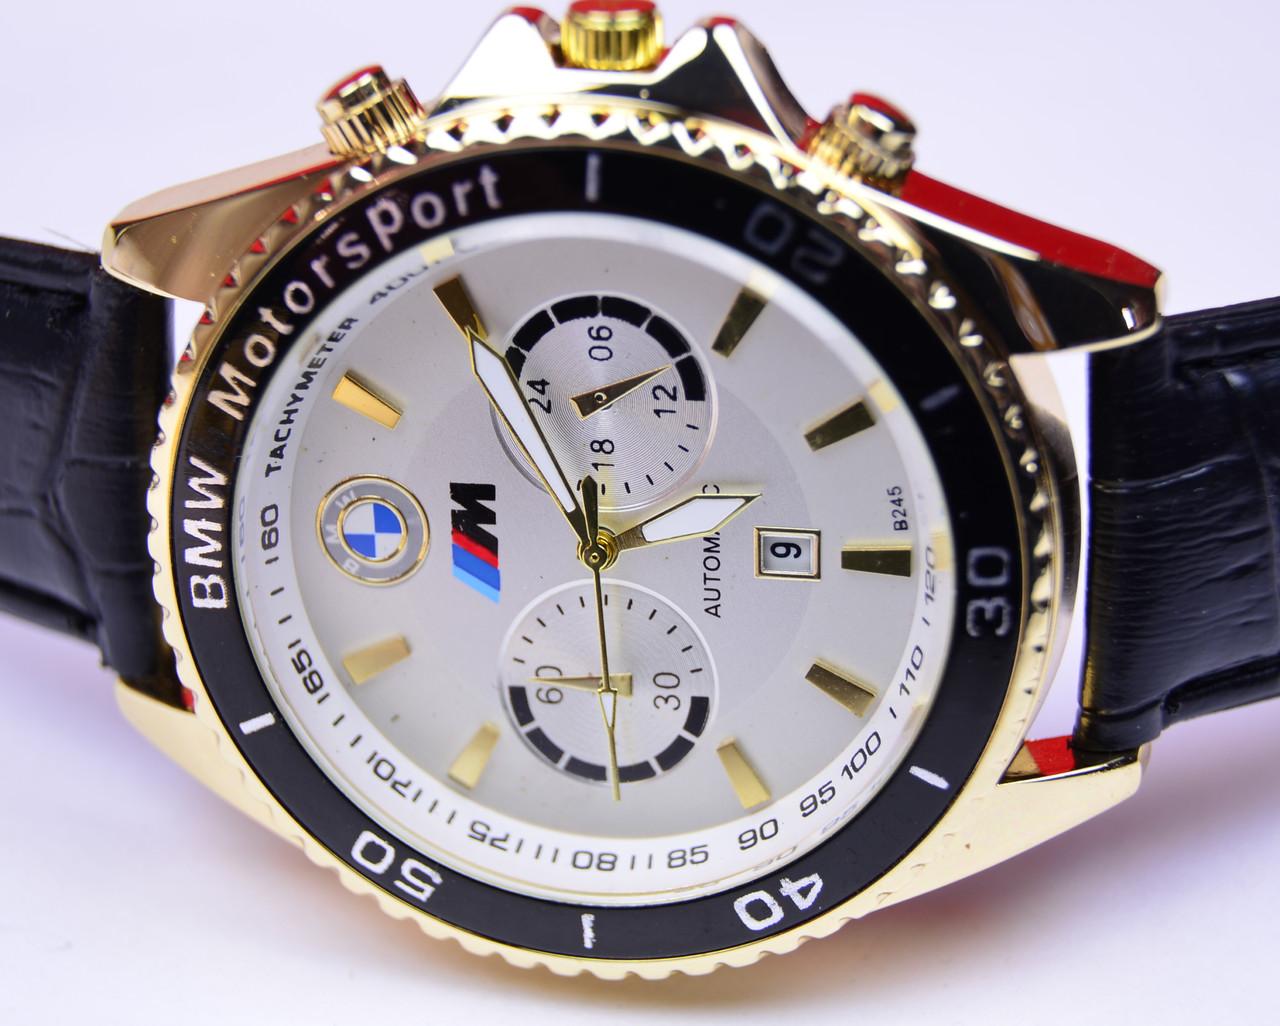 49219bfc Мужские наручные часы BMW (B243) кварц календарь: продажа, цена в ...